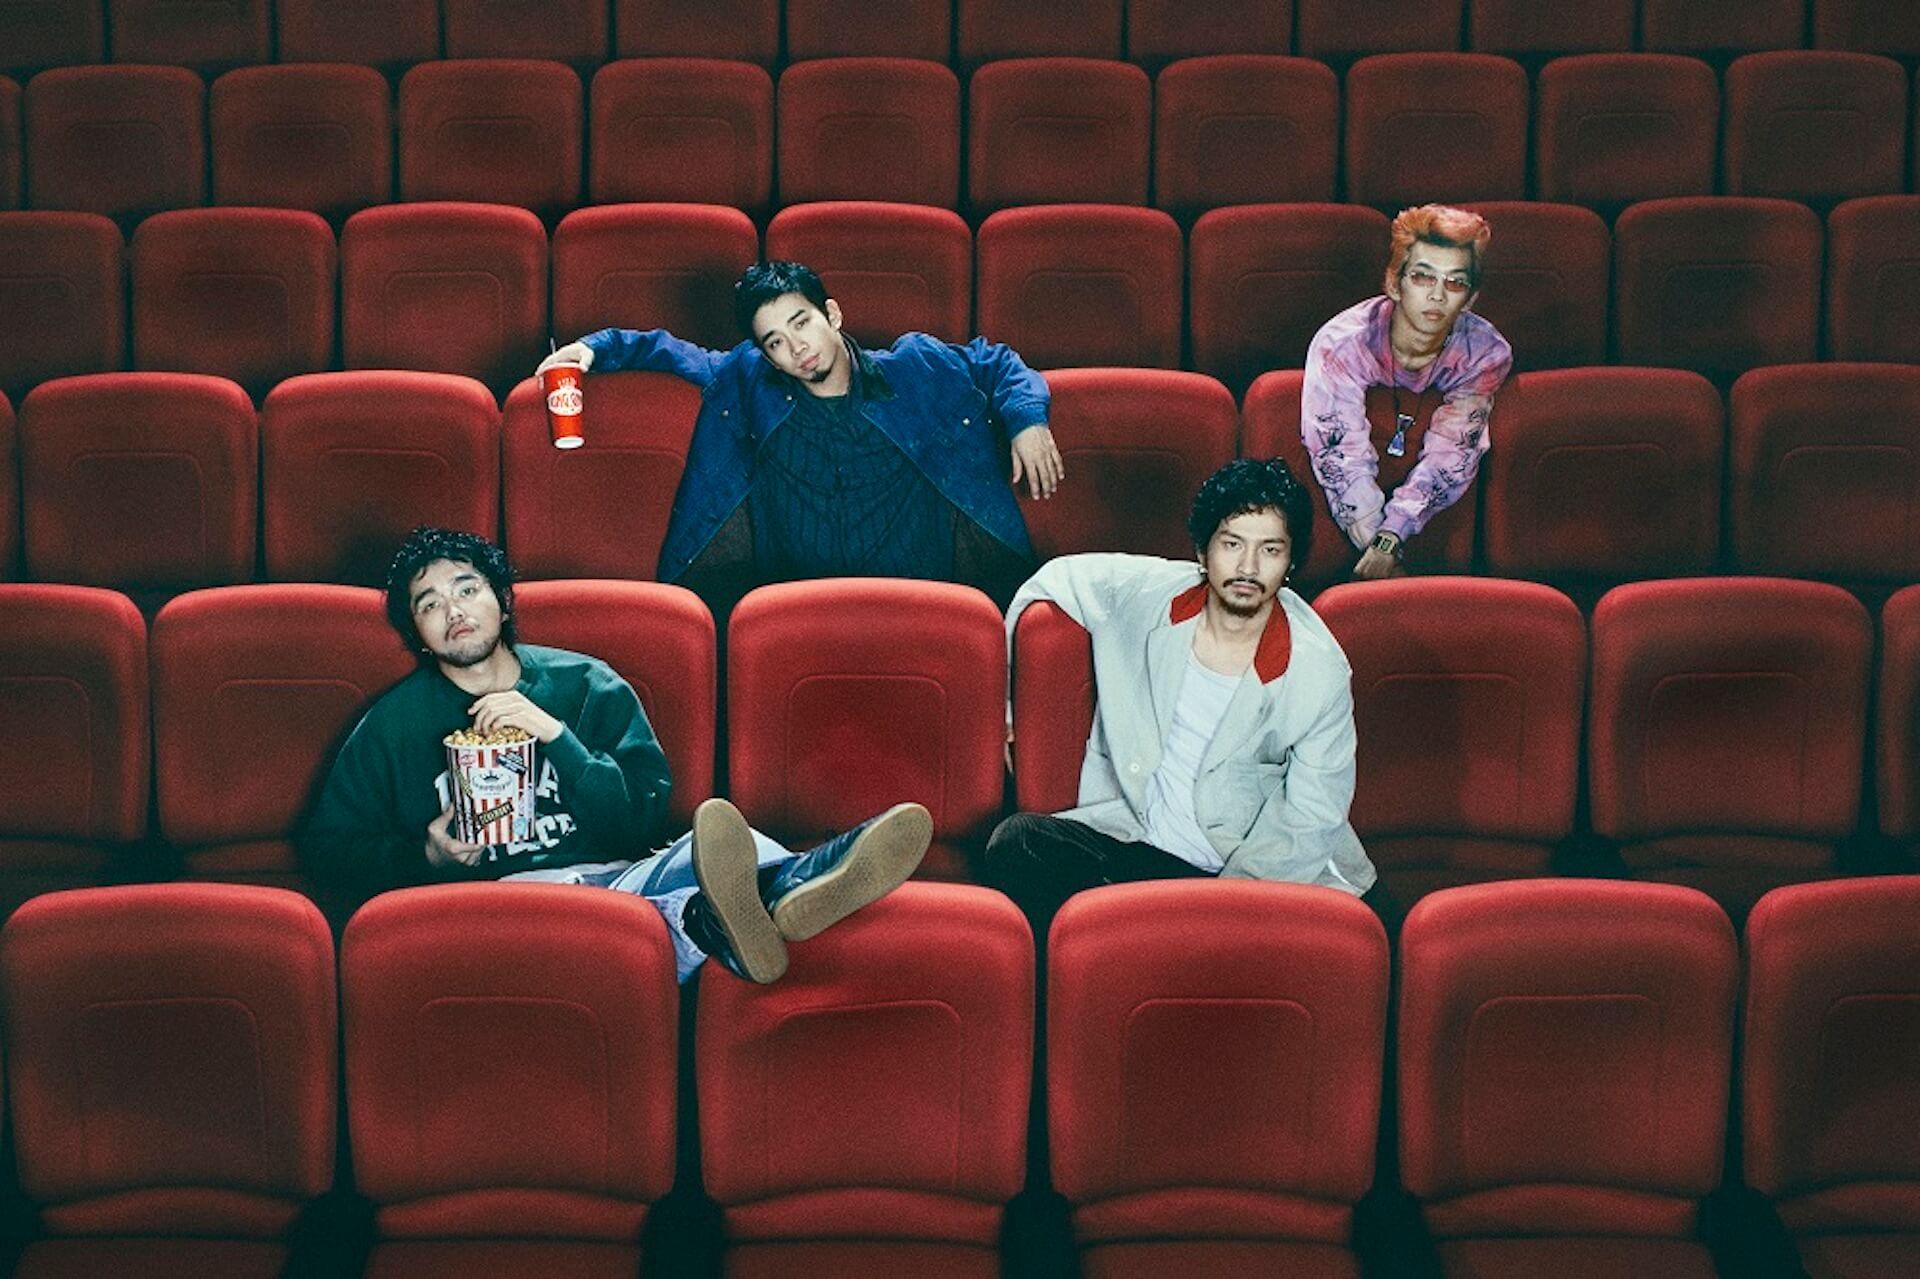 King Gnu、前人未到の快挙!Apple Musicにてアルバム発売初週の日本人アーティスト史上最高記録を達成 music200127_kinggnu_2